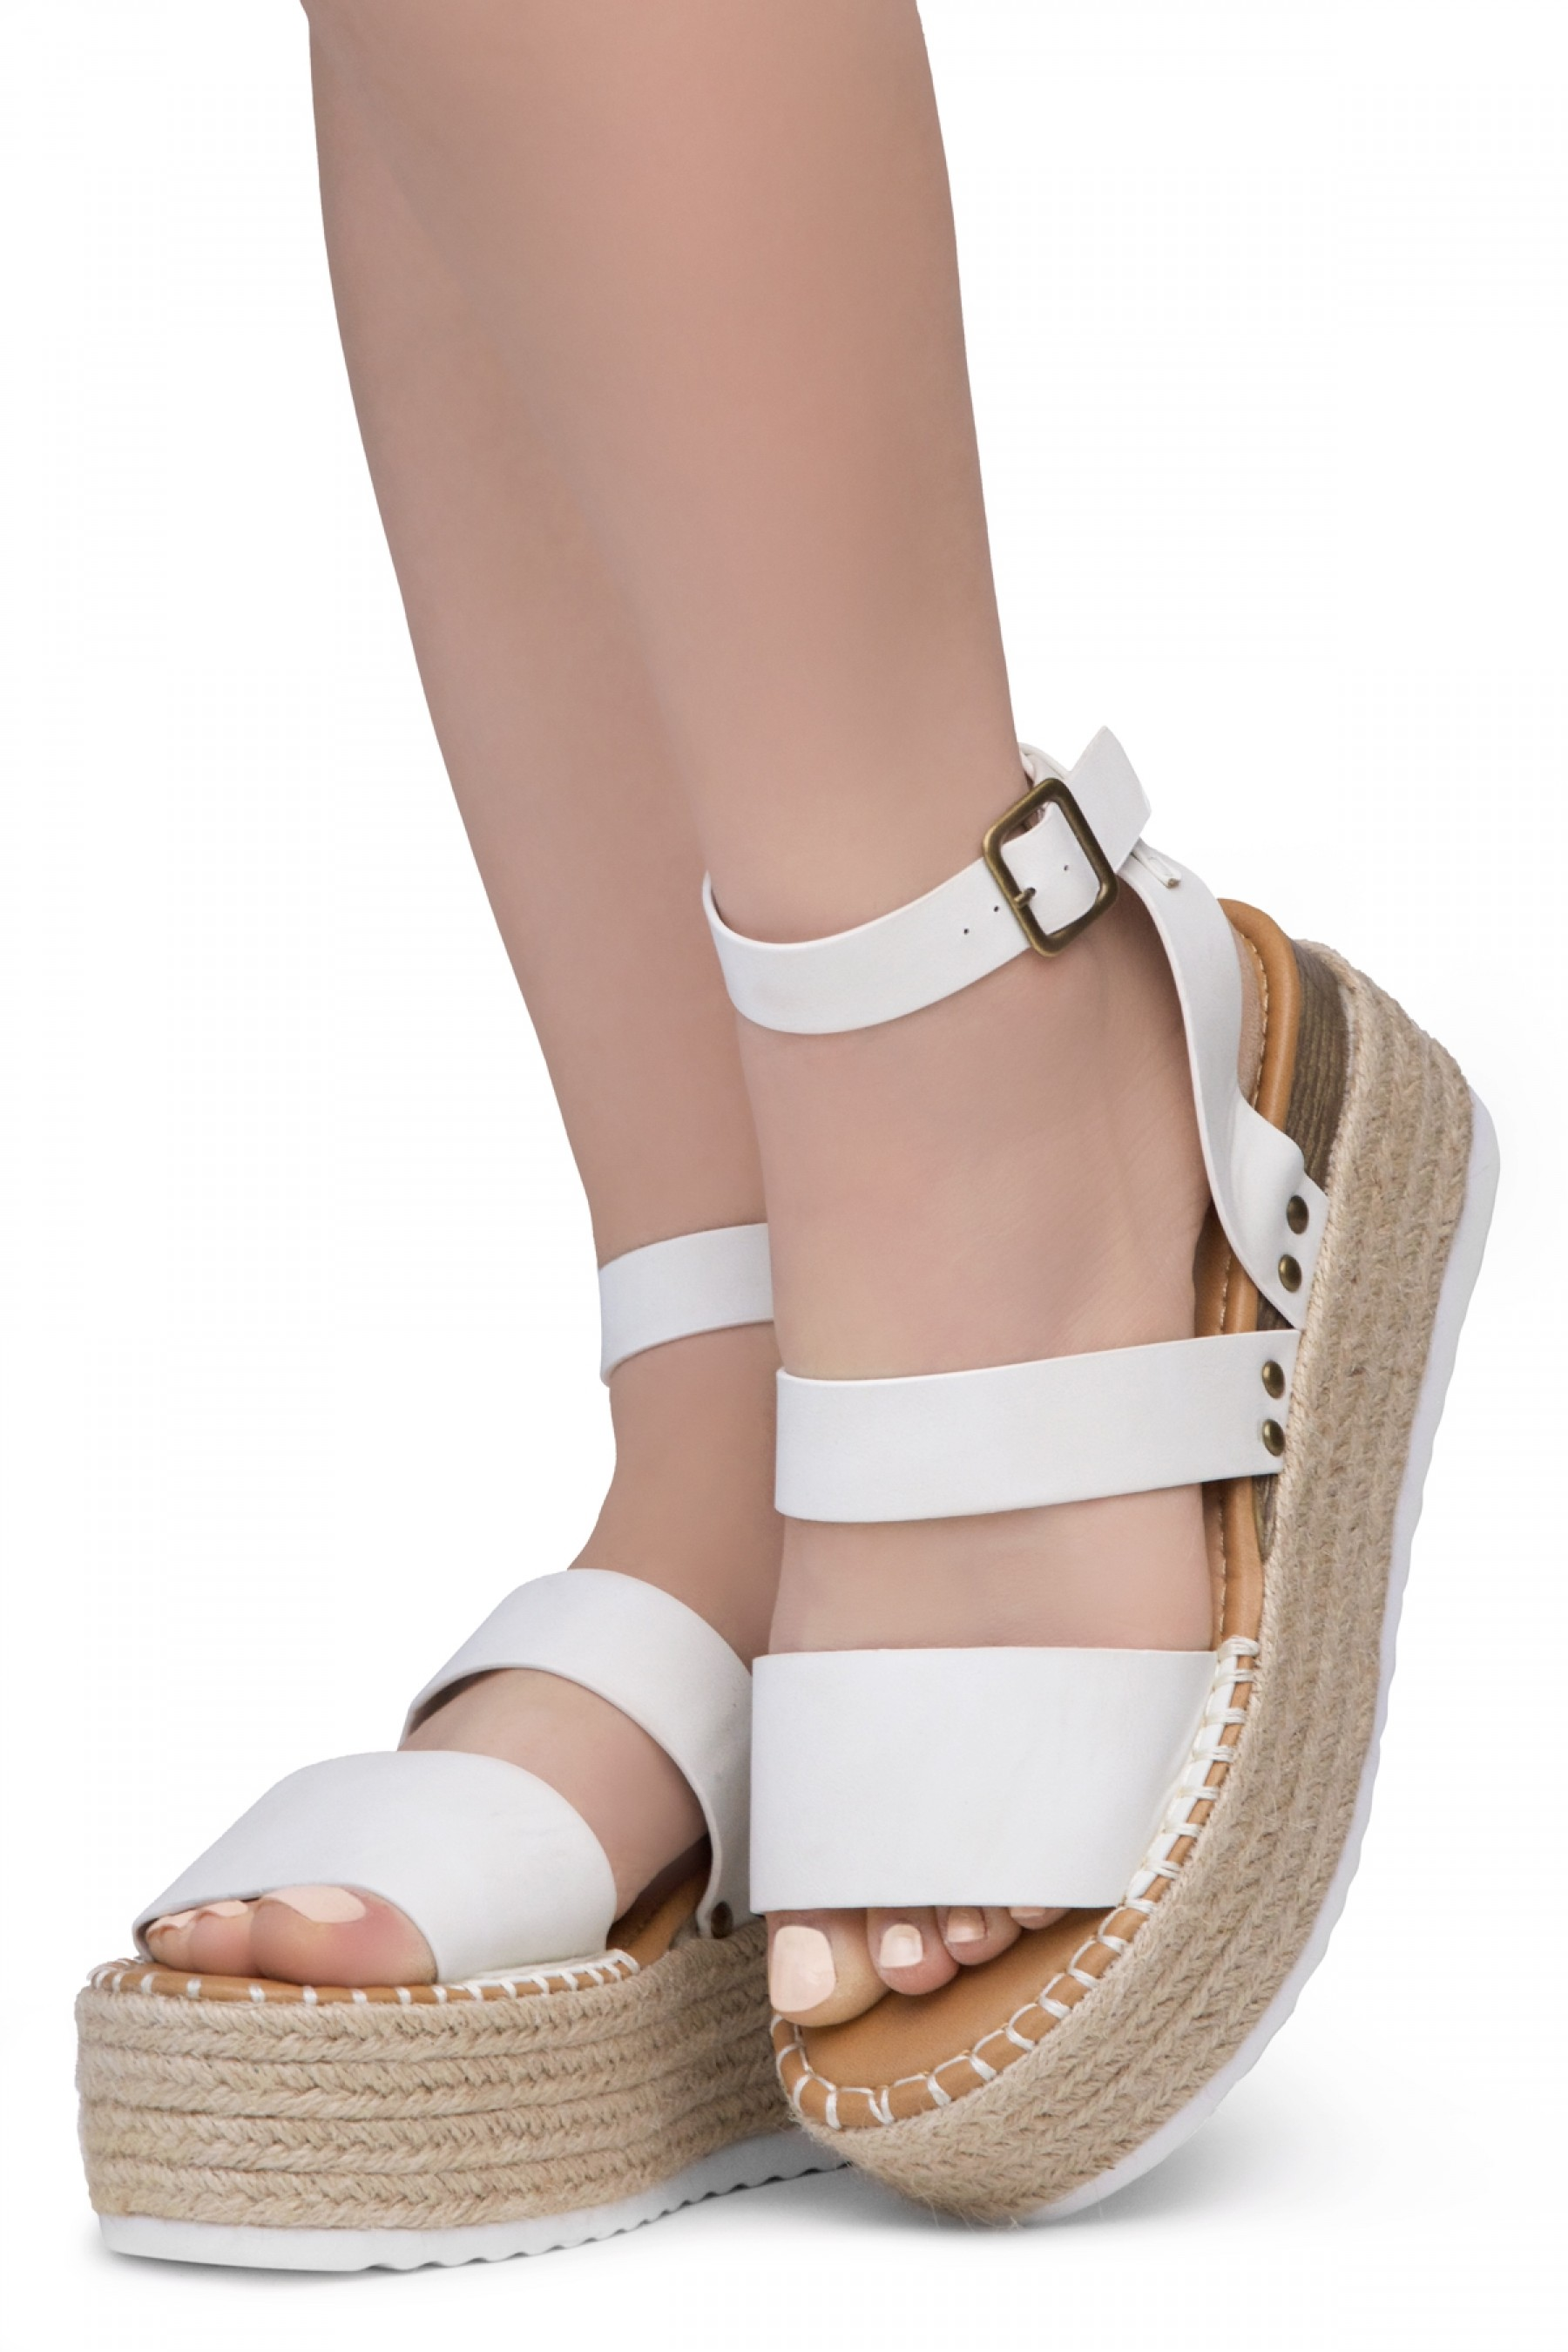 Shoe Land SL-Capri Womens Open Toe Ankle Strap Platform Sandals Causal Espadrille Wedge Shoes(OffWhite)